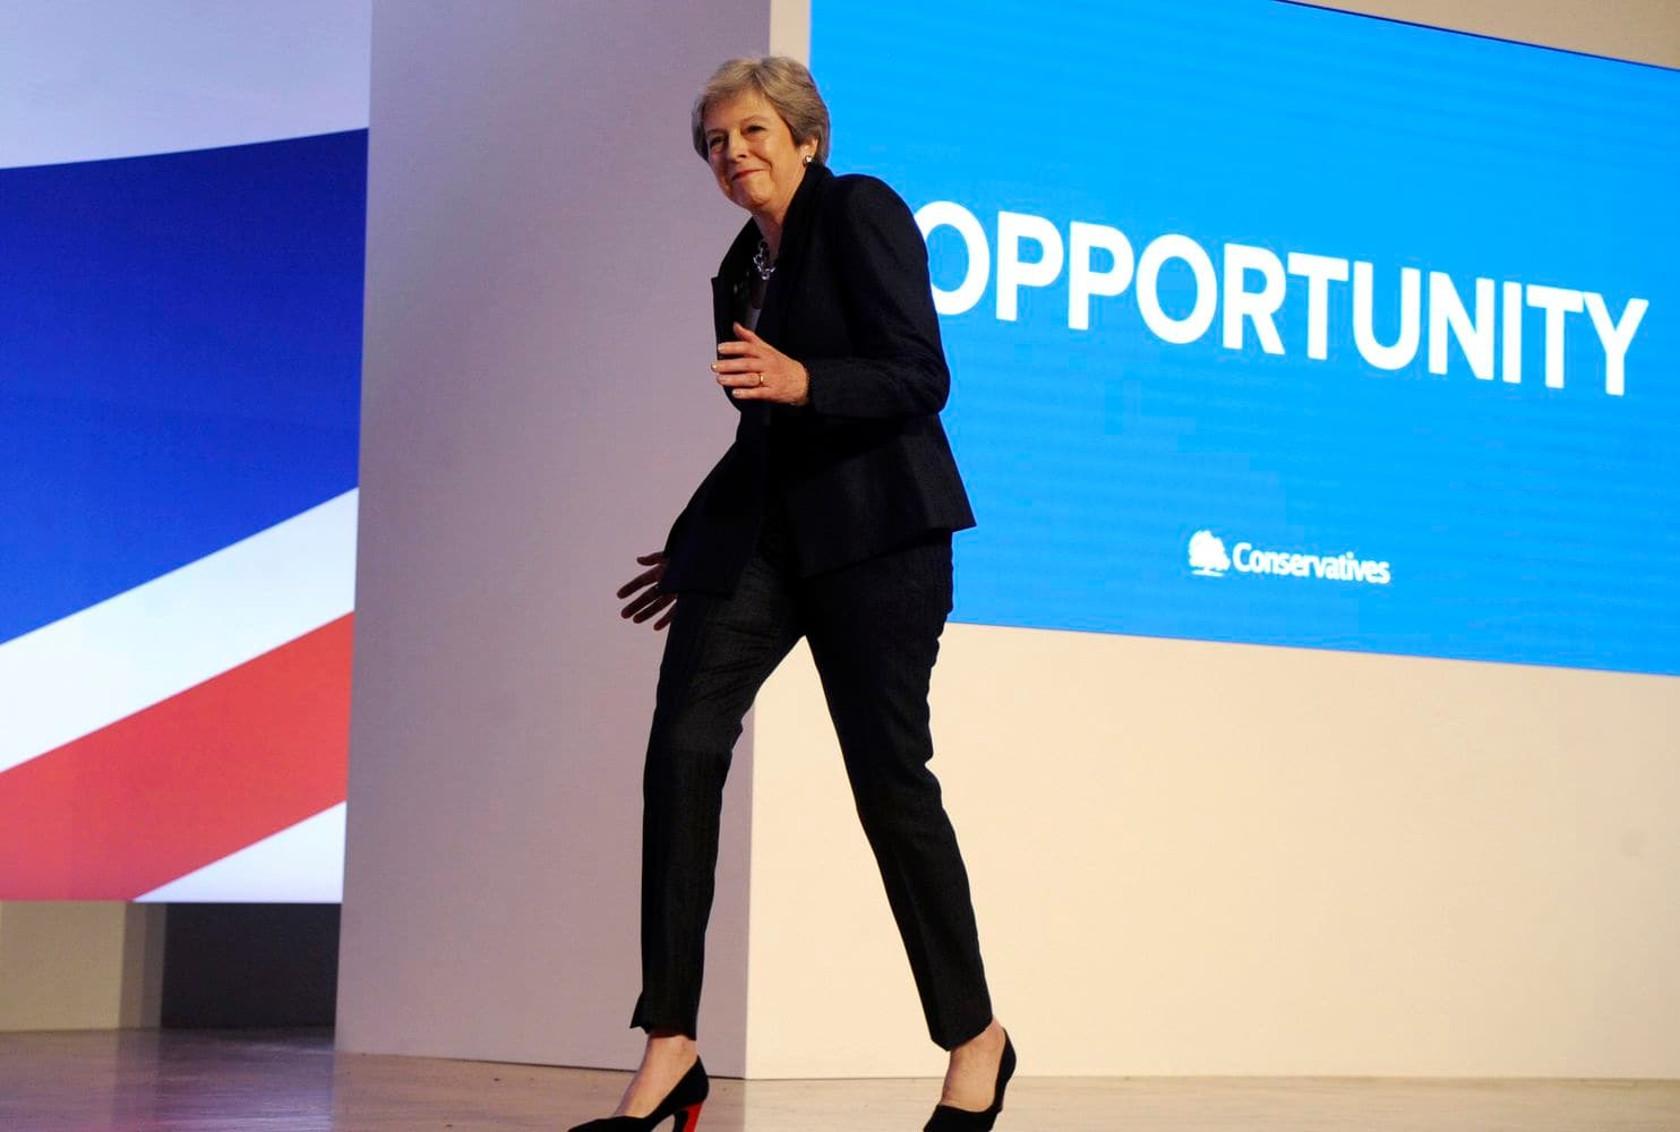 Лучшие танцы Терезы Мэй | Theresa may's best dance